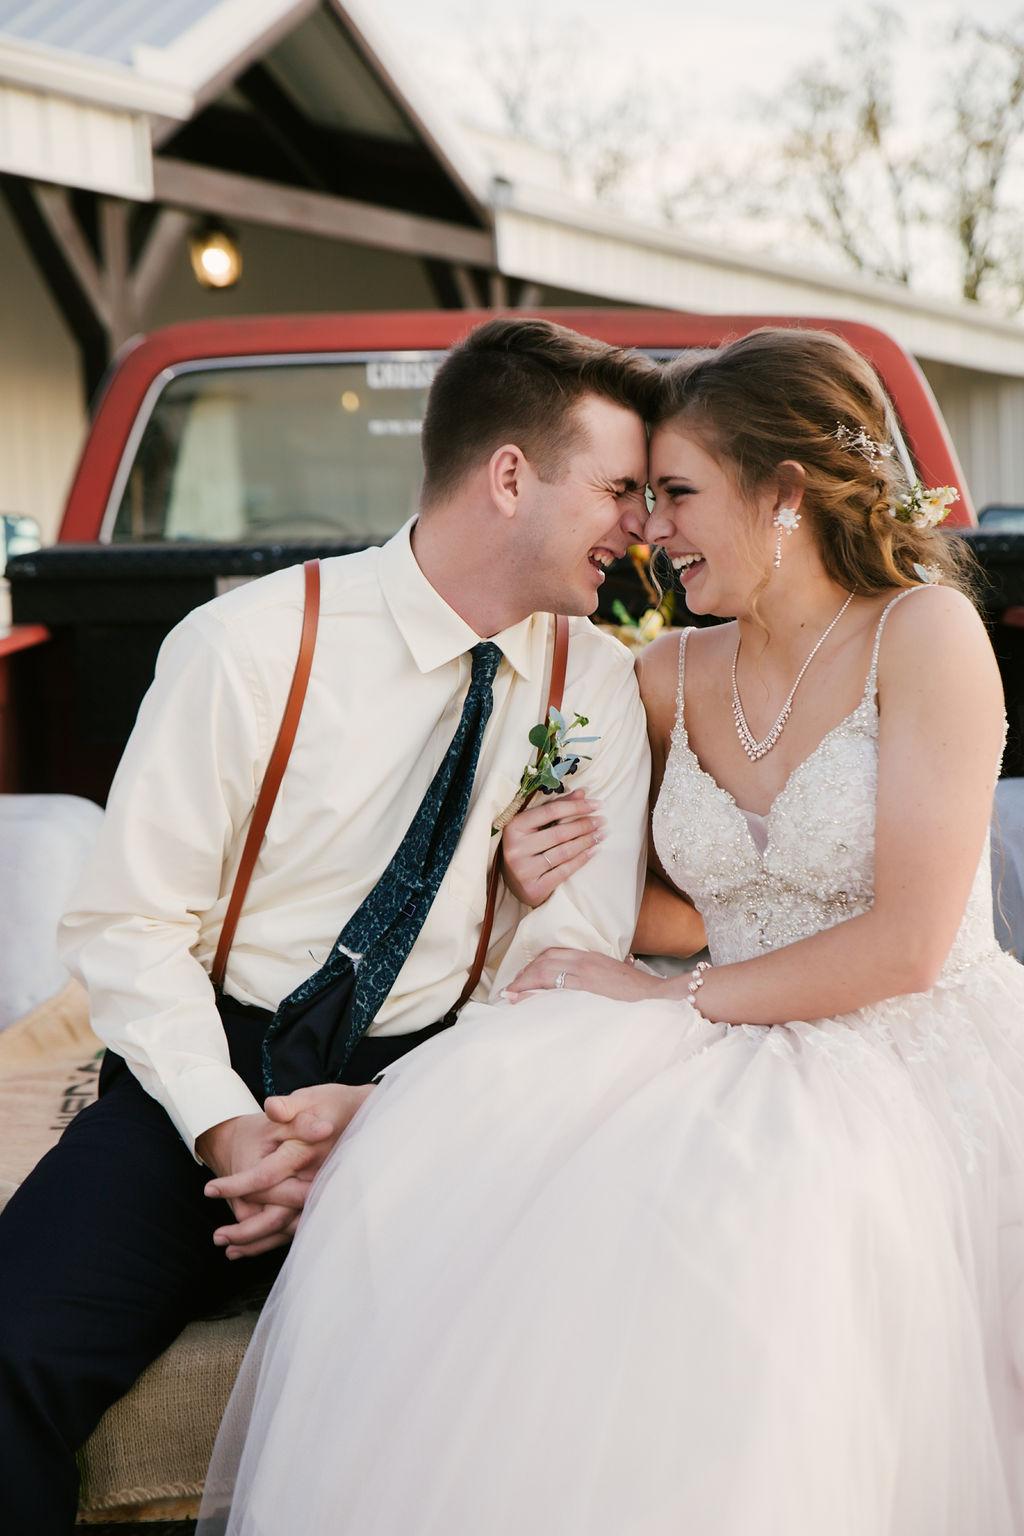 Tulsa Best Outdoor Wedding Venue 0a.jpg